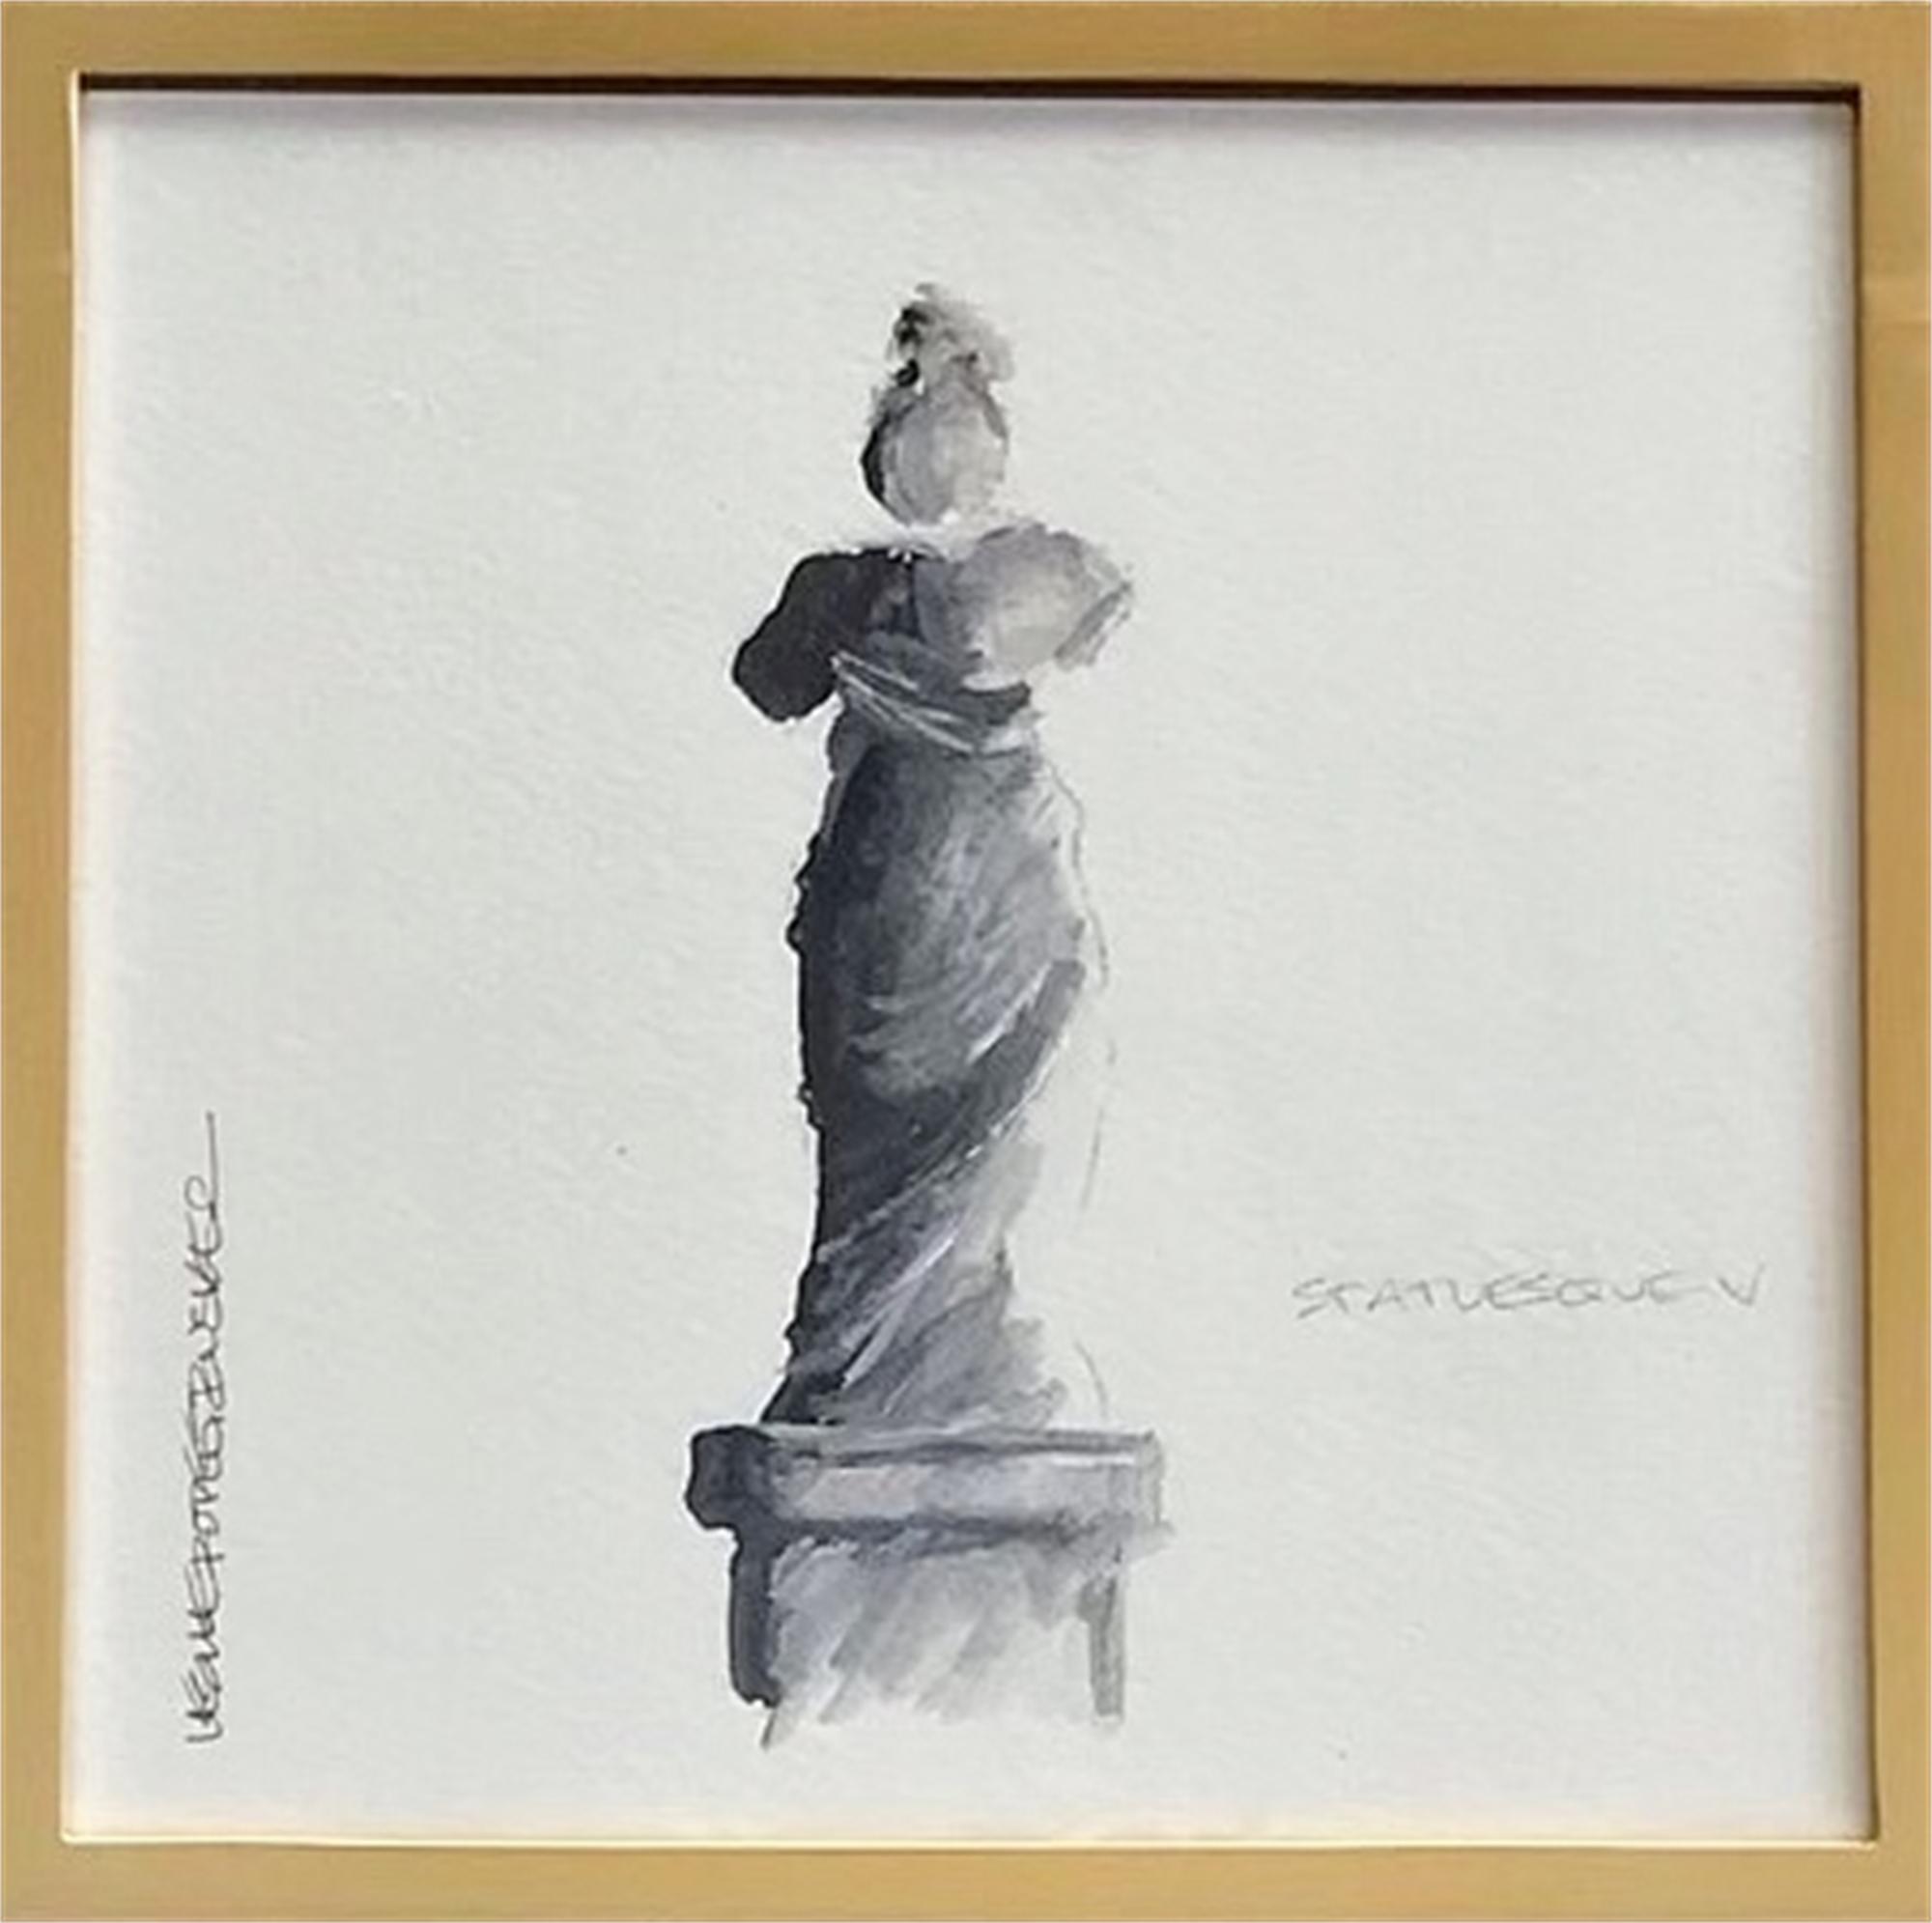 Statuesque V by Leslie Poteet Busker